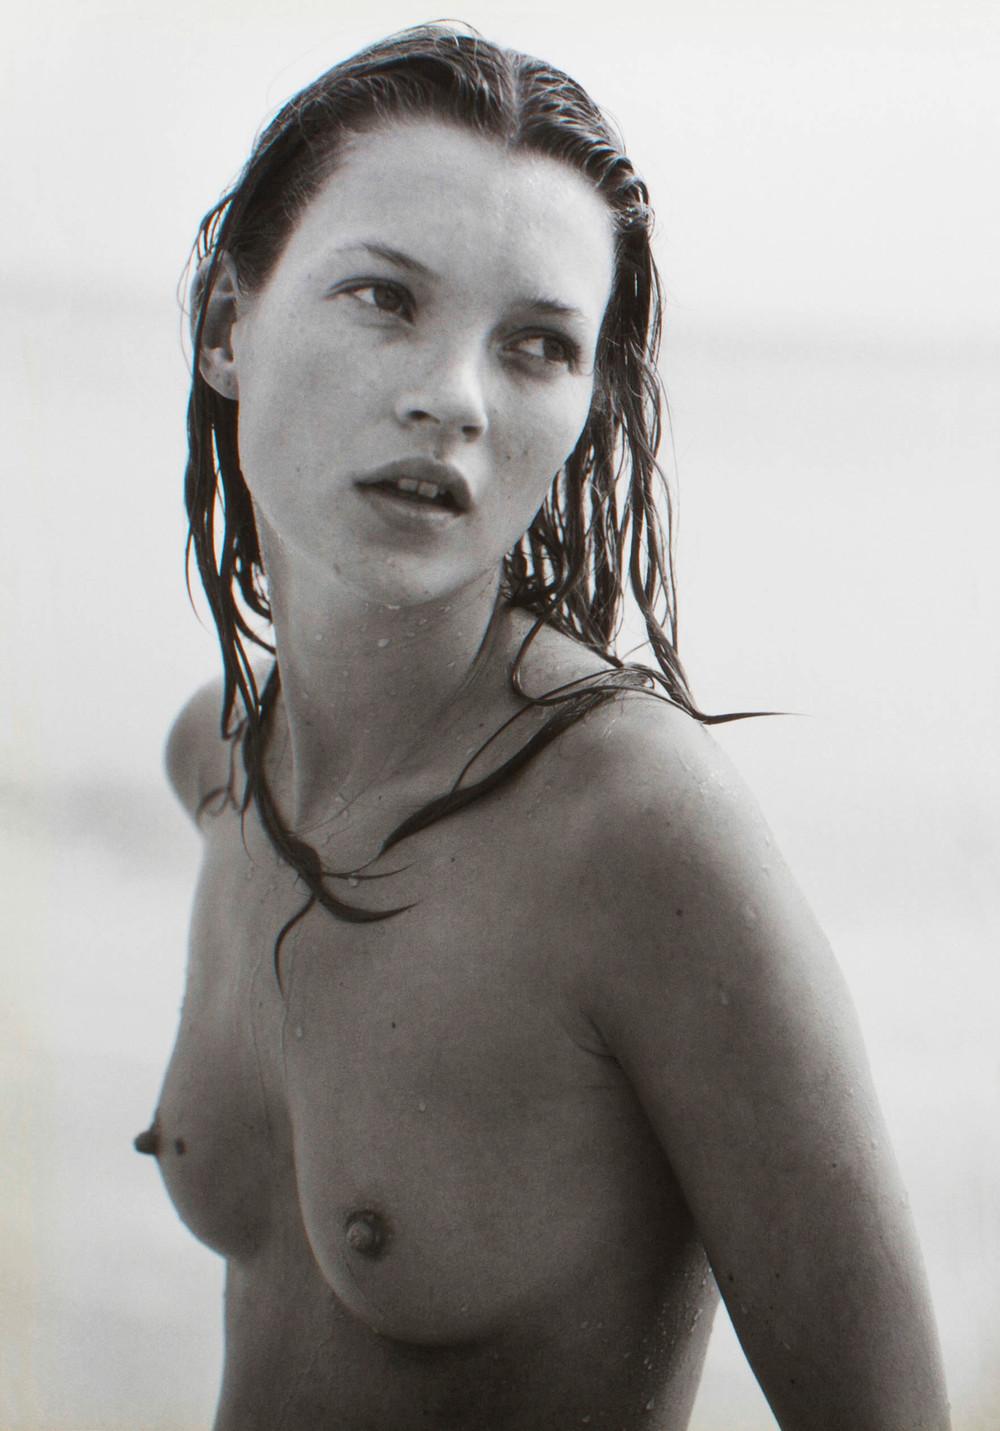 Kate_Moss-Bruce_Weber-Joes-034.jpg